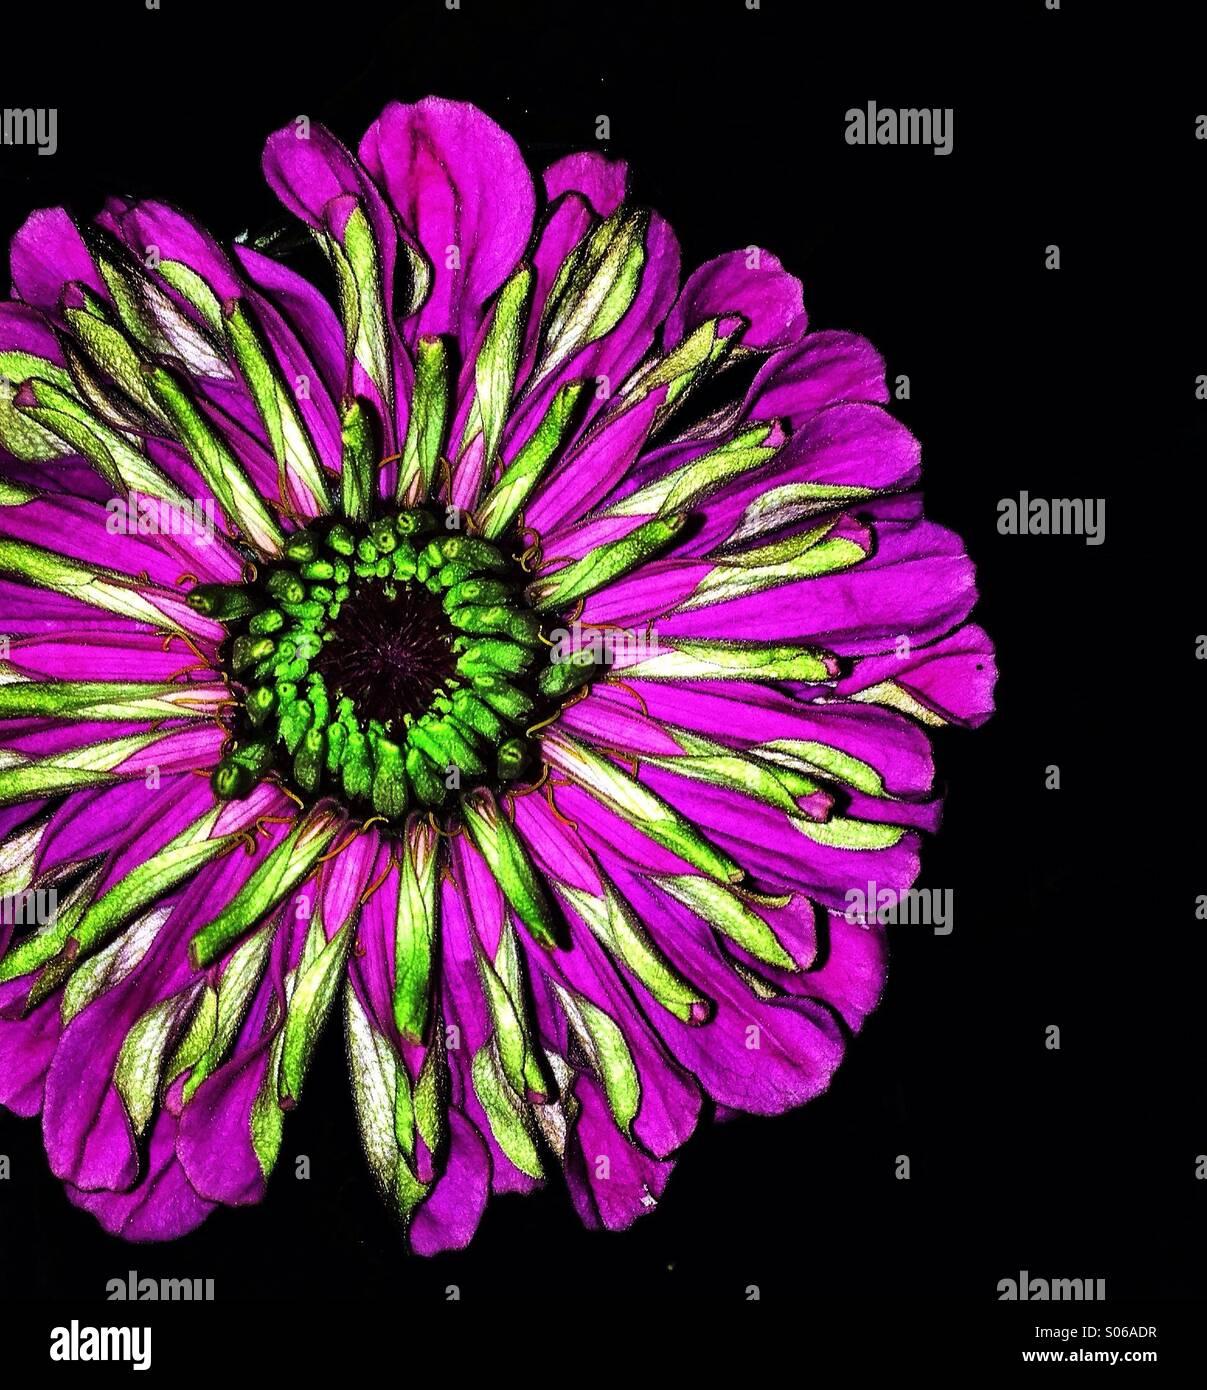 Flor vibrante Imagen De Stock